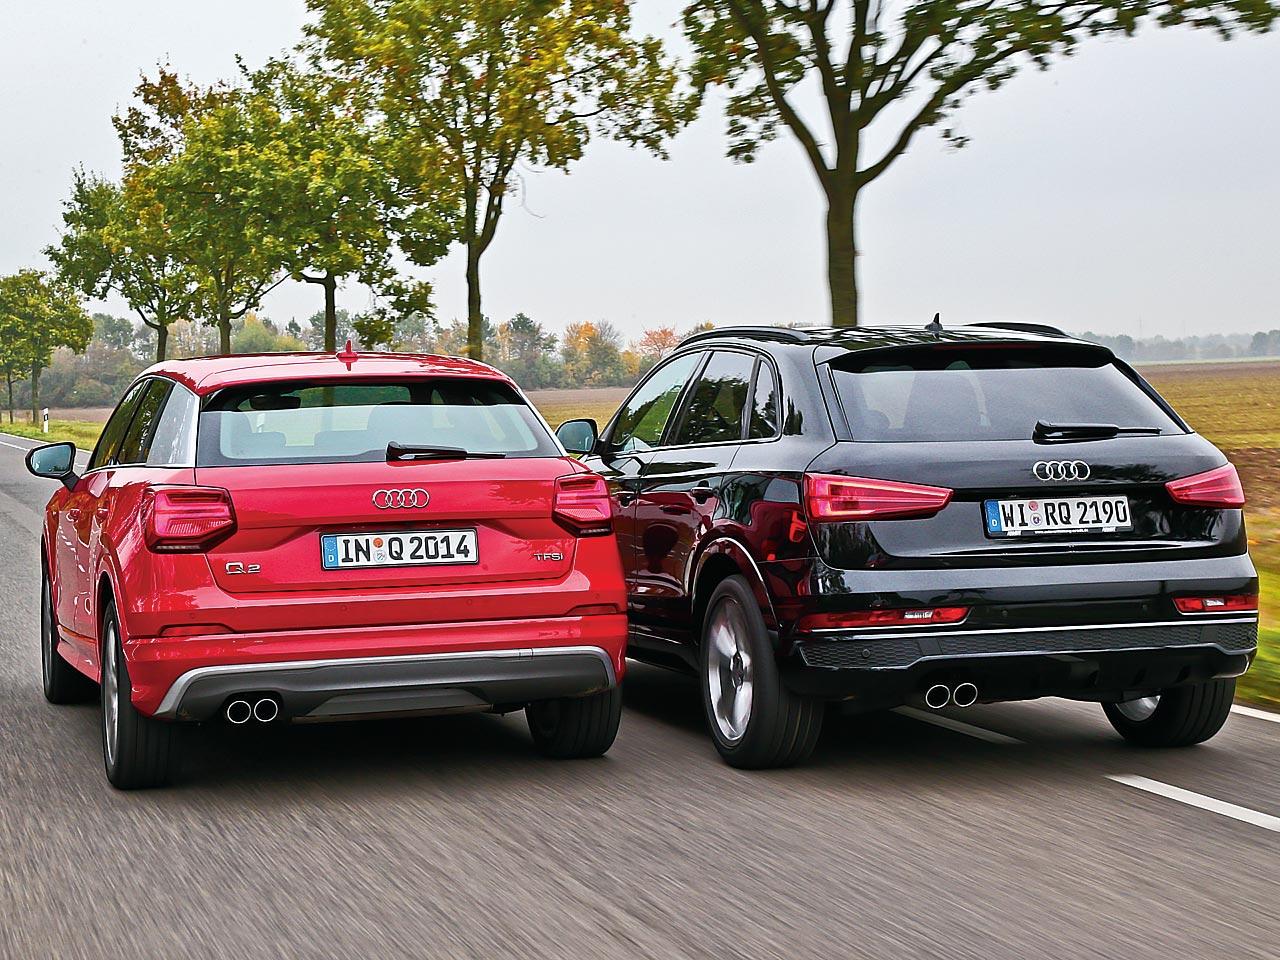 Audi Q2 Audi Q3 Vergleichstest Autozeitung De